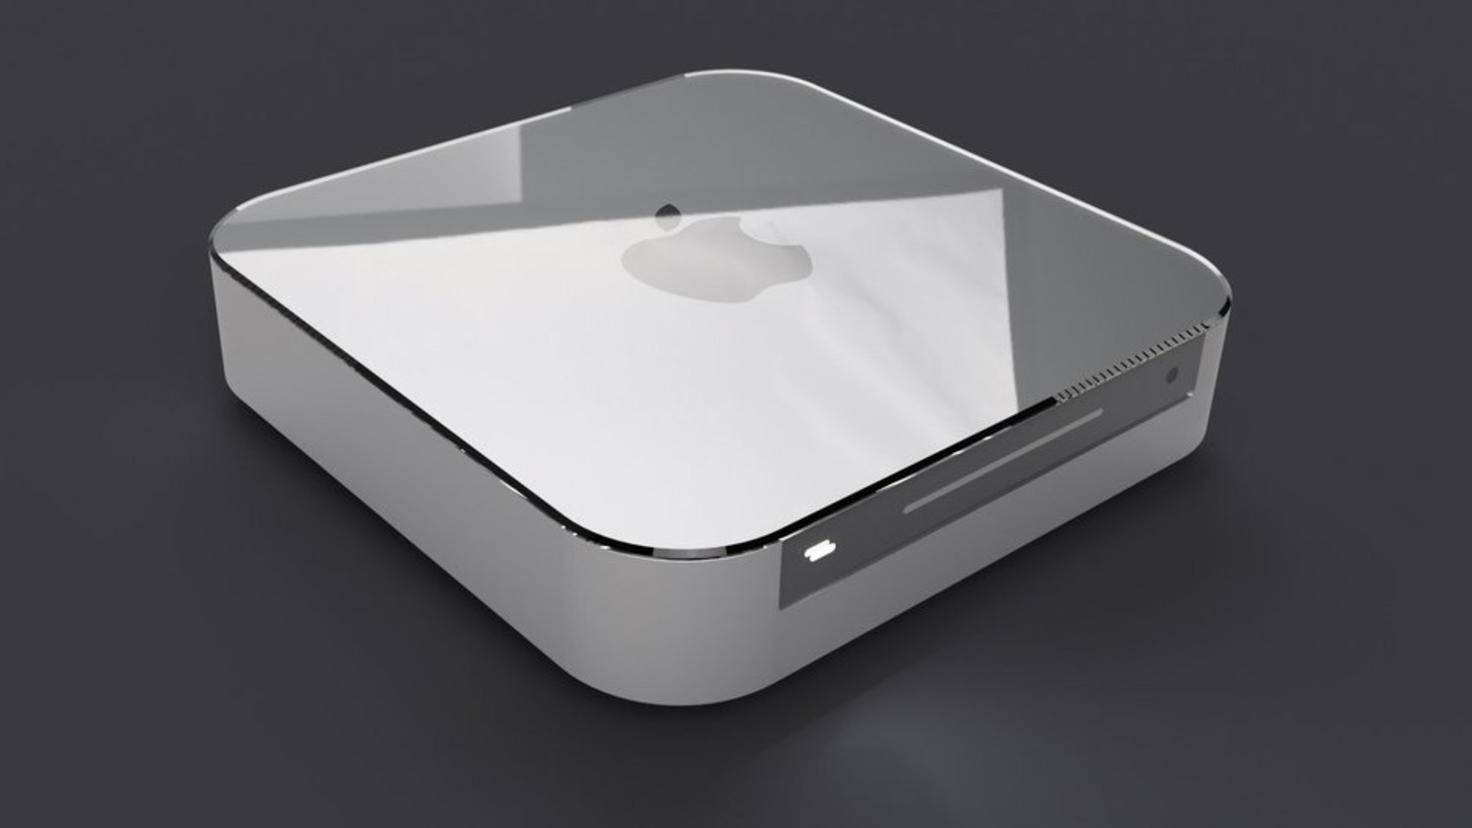 mac-mini-concept